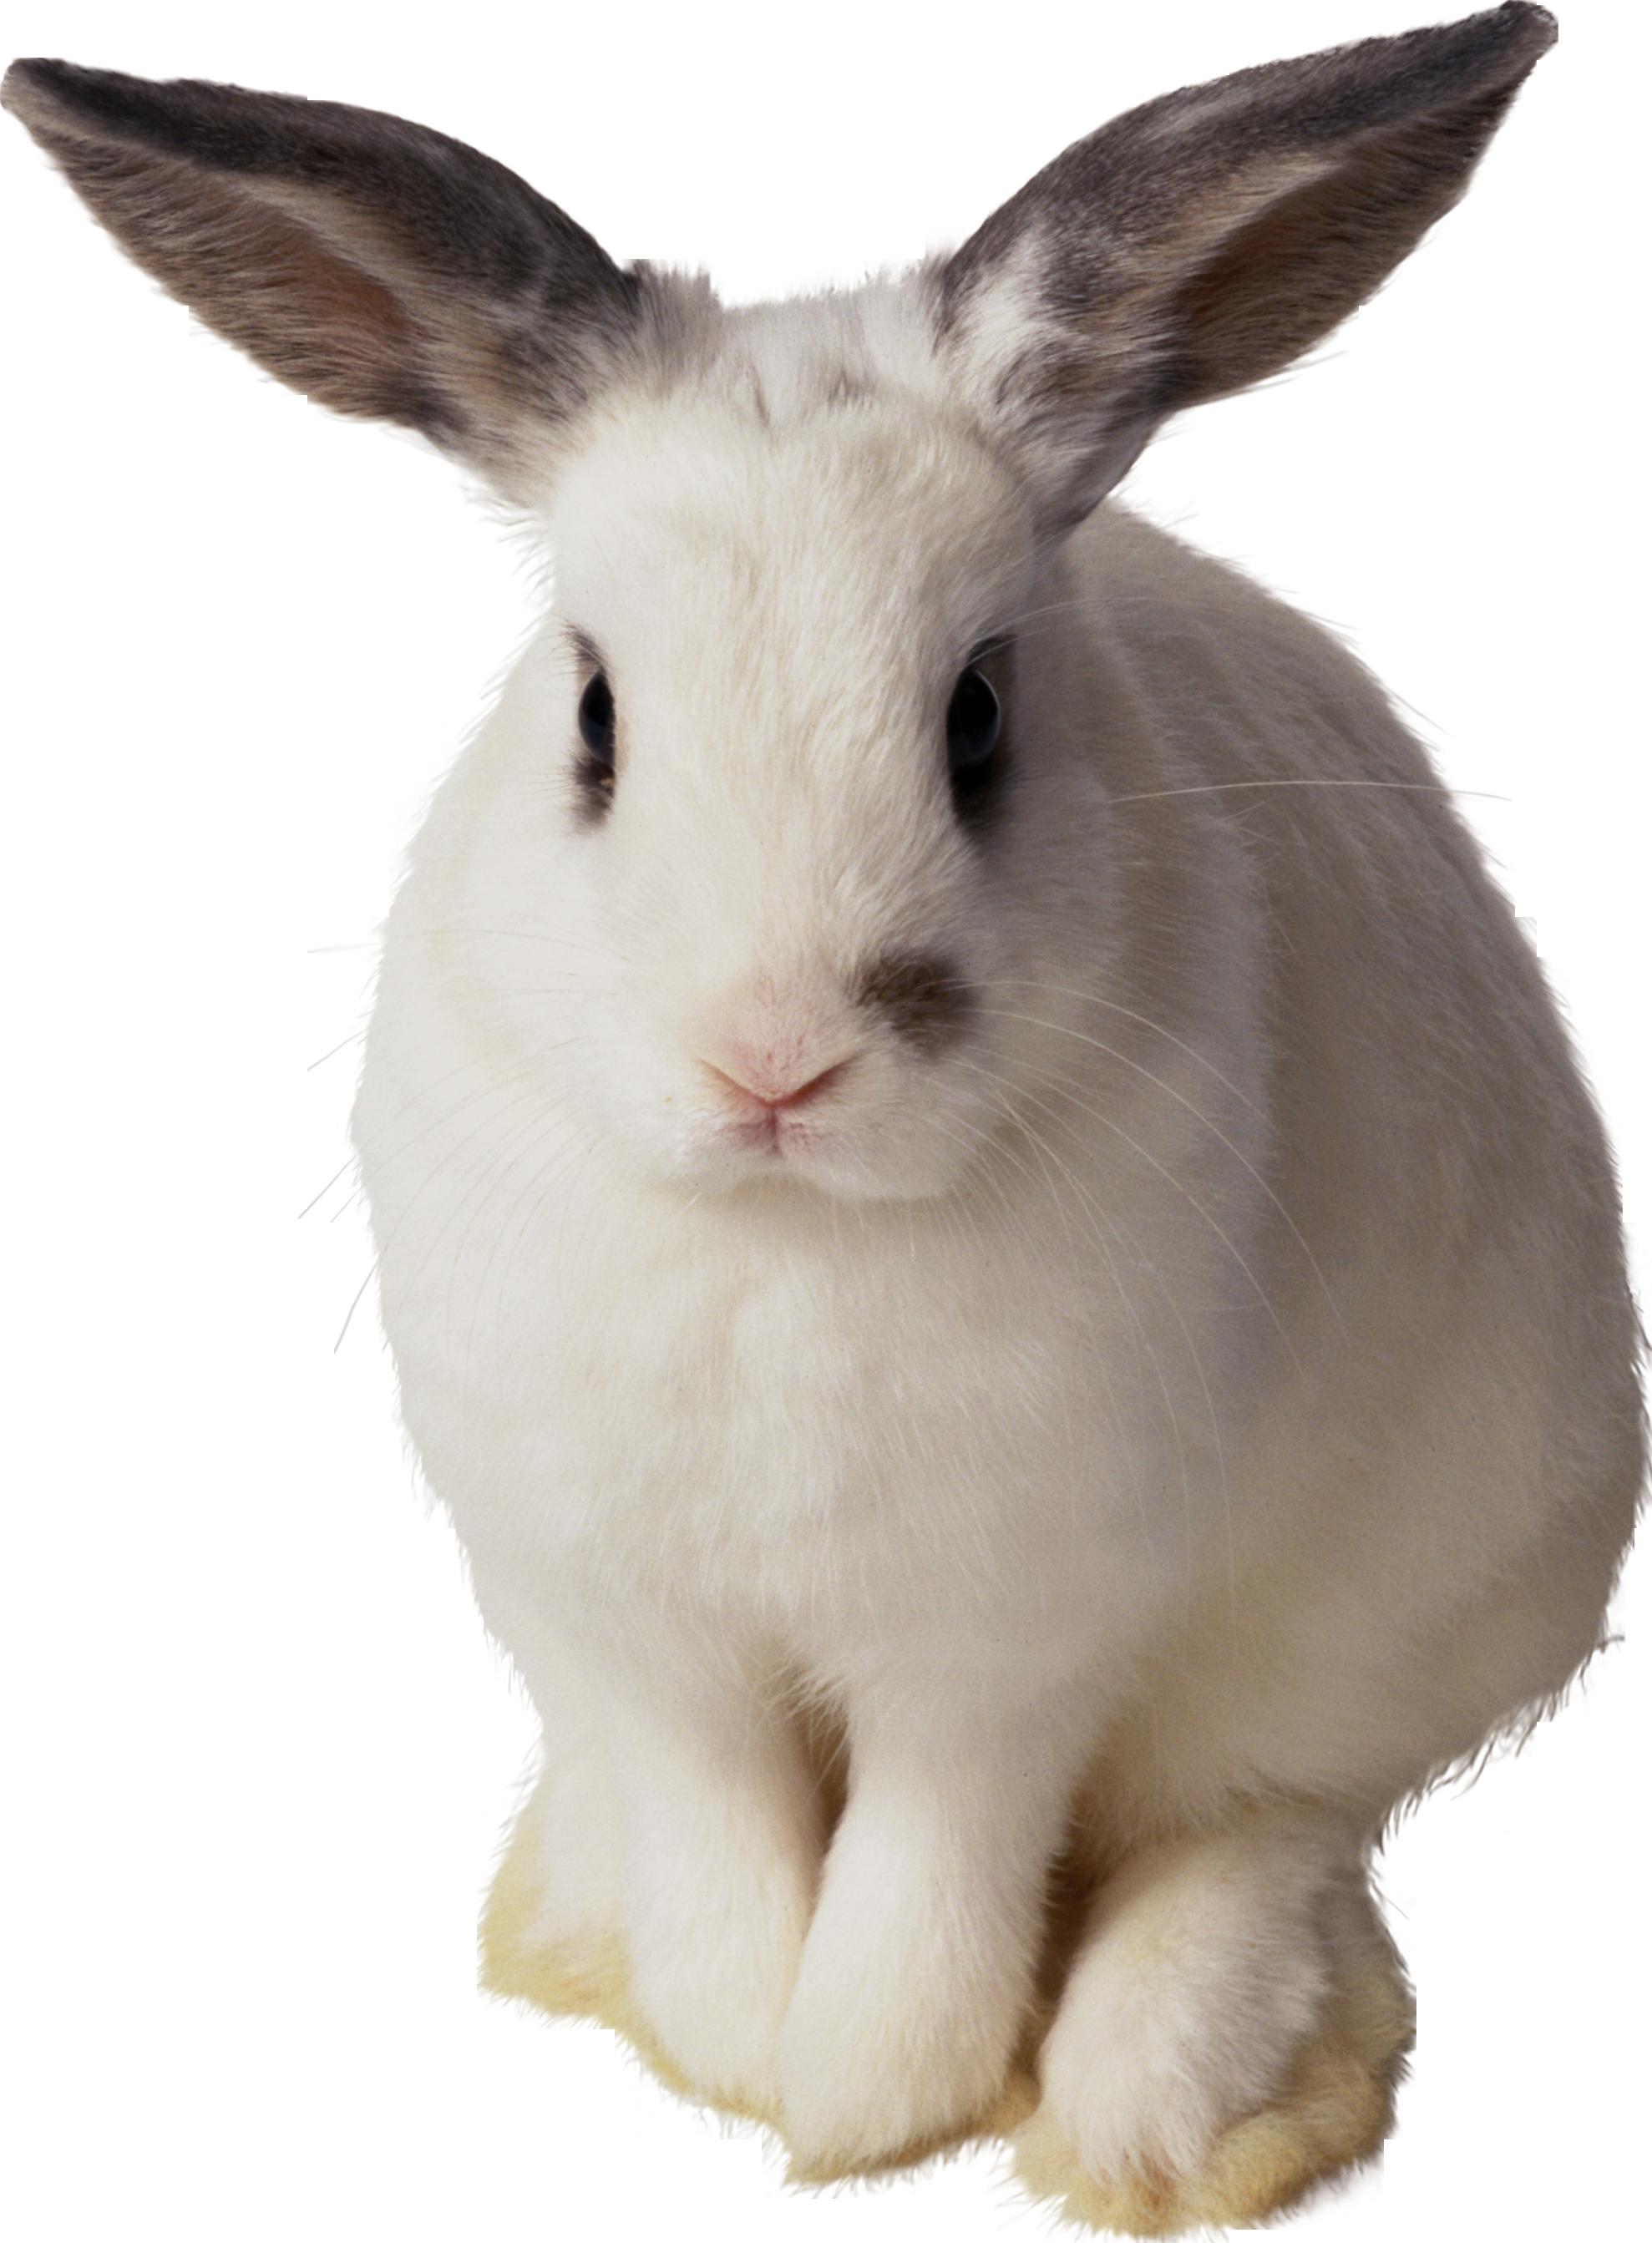 White Rabbit Png Image Rabbit Png Rabbit Animals